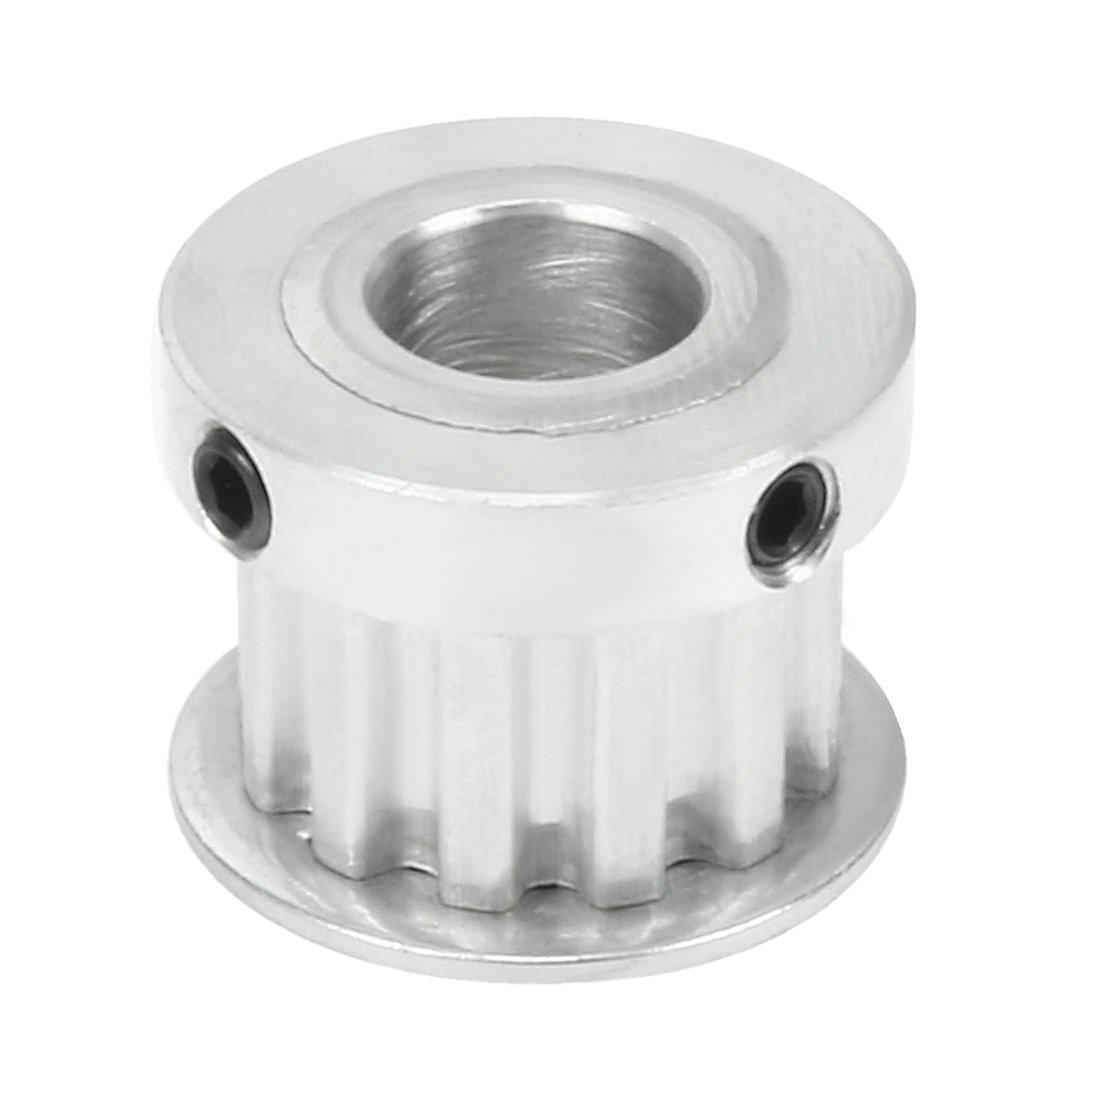 sourcingmap Aluminum GT2 20 Teeth 8mm Bore Timing Belt Pulley Flange Wheel for 3D Printer